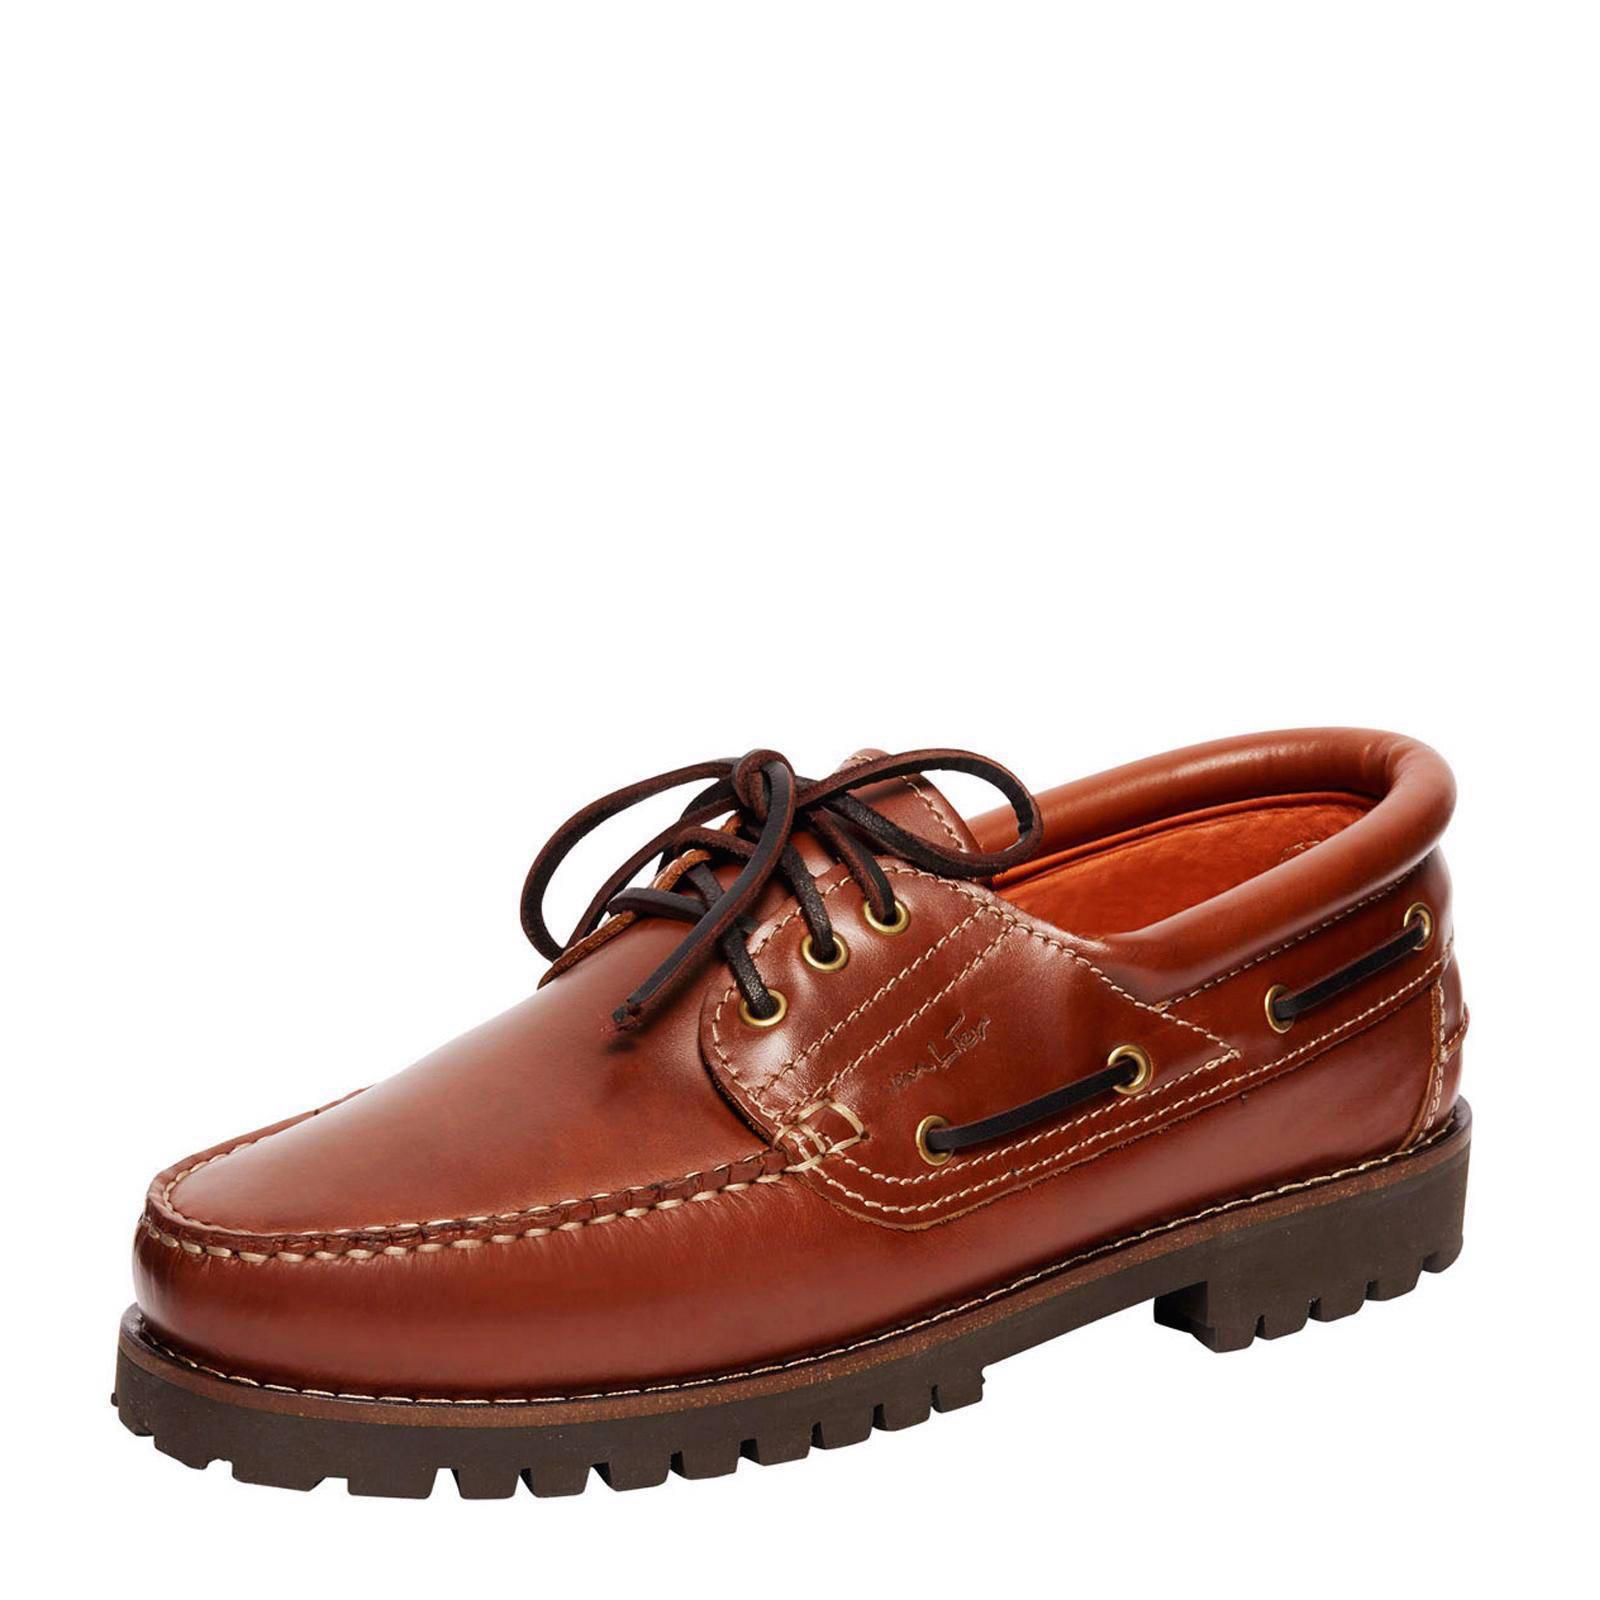 leren bootschoenen dames